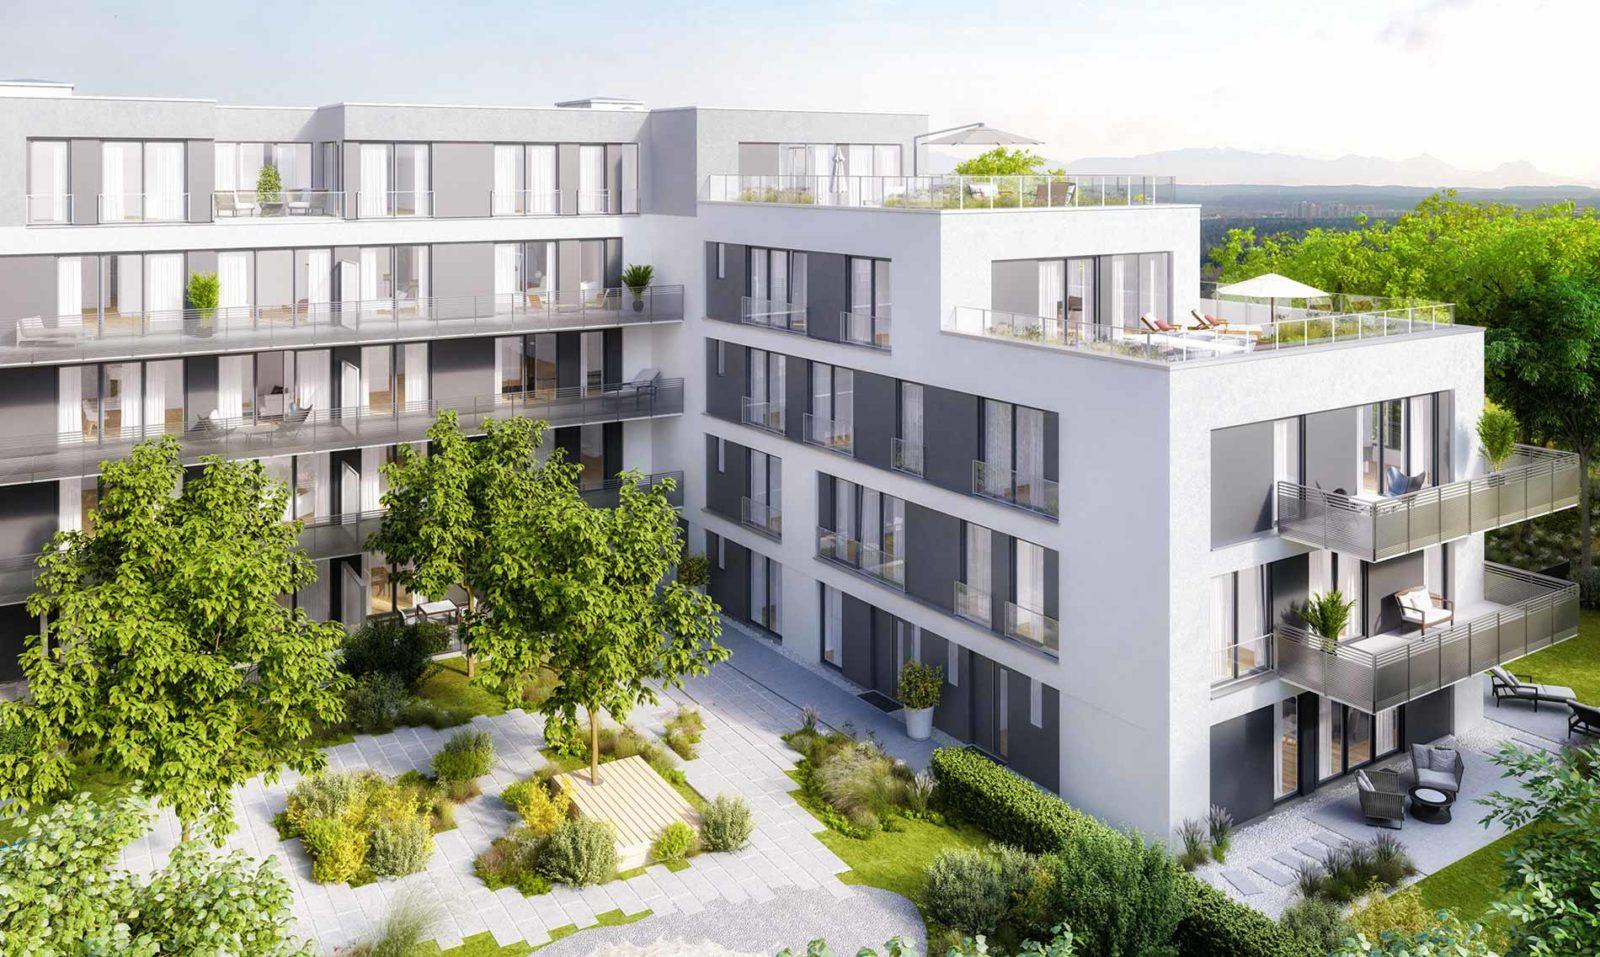 München Hochufer Immobilienprojekt